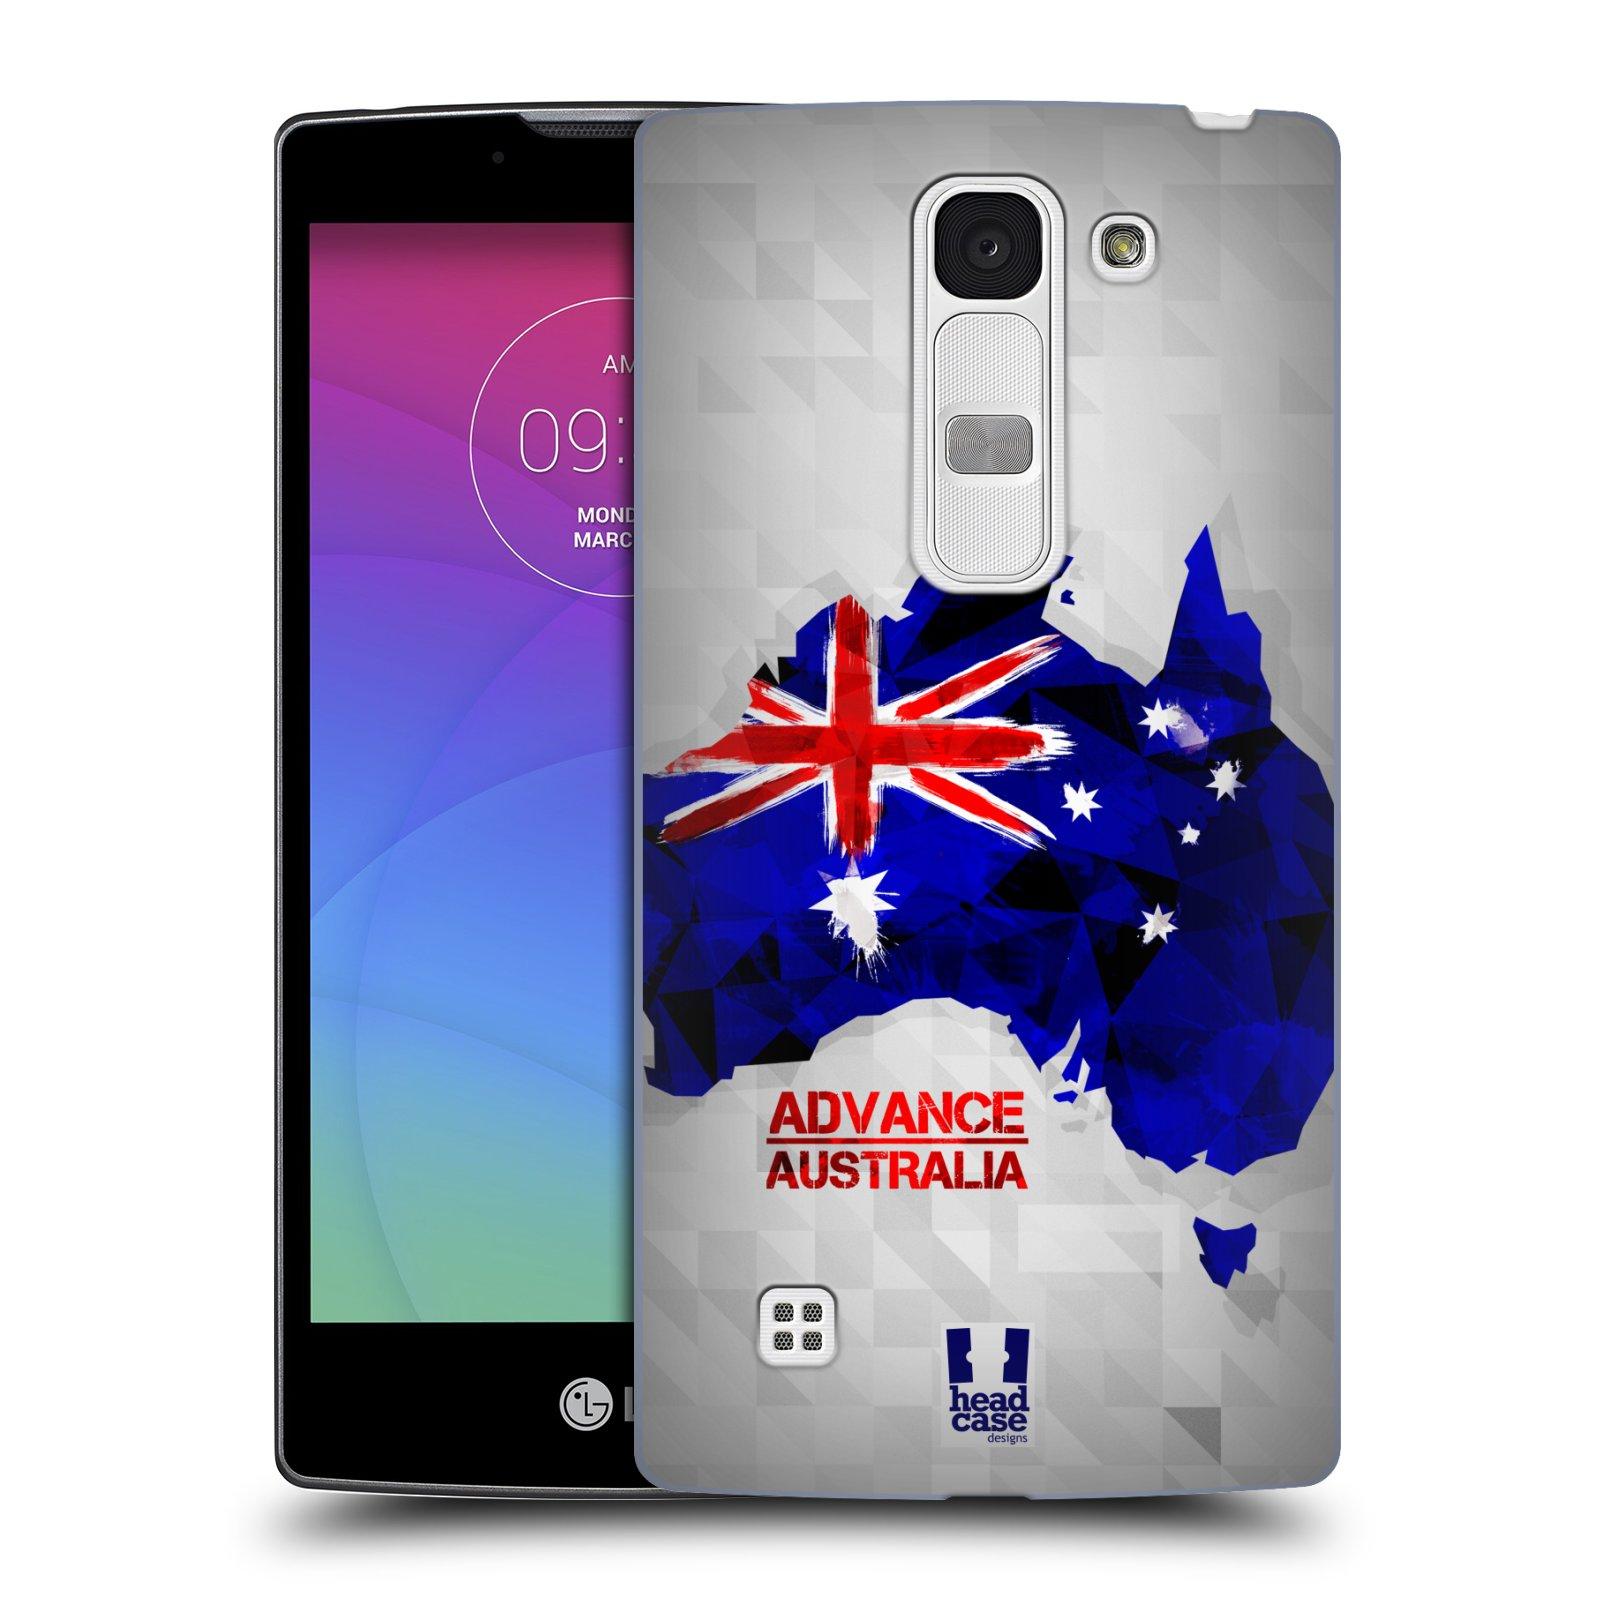 Plastové pouzdro na mobil LG Spirit LTE HEAD CASE GEOMAPA AUSTRÁLIE (Kryt či obal na mobilní telefon LG Spirit H420 a LG Spirit LTE H440N)